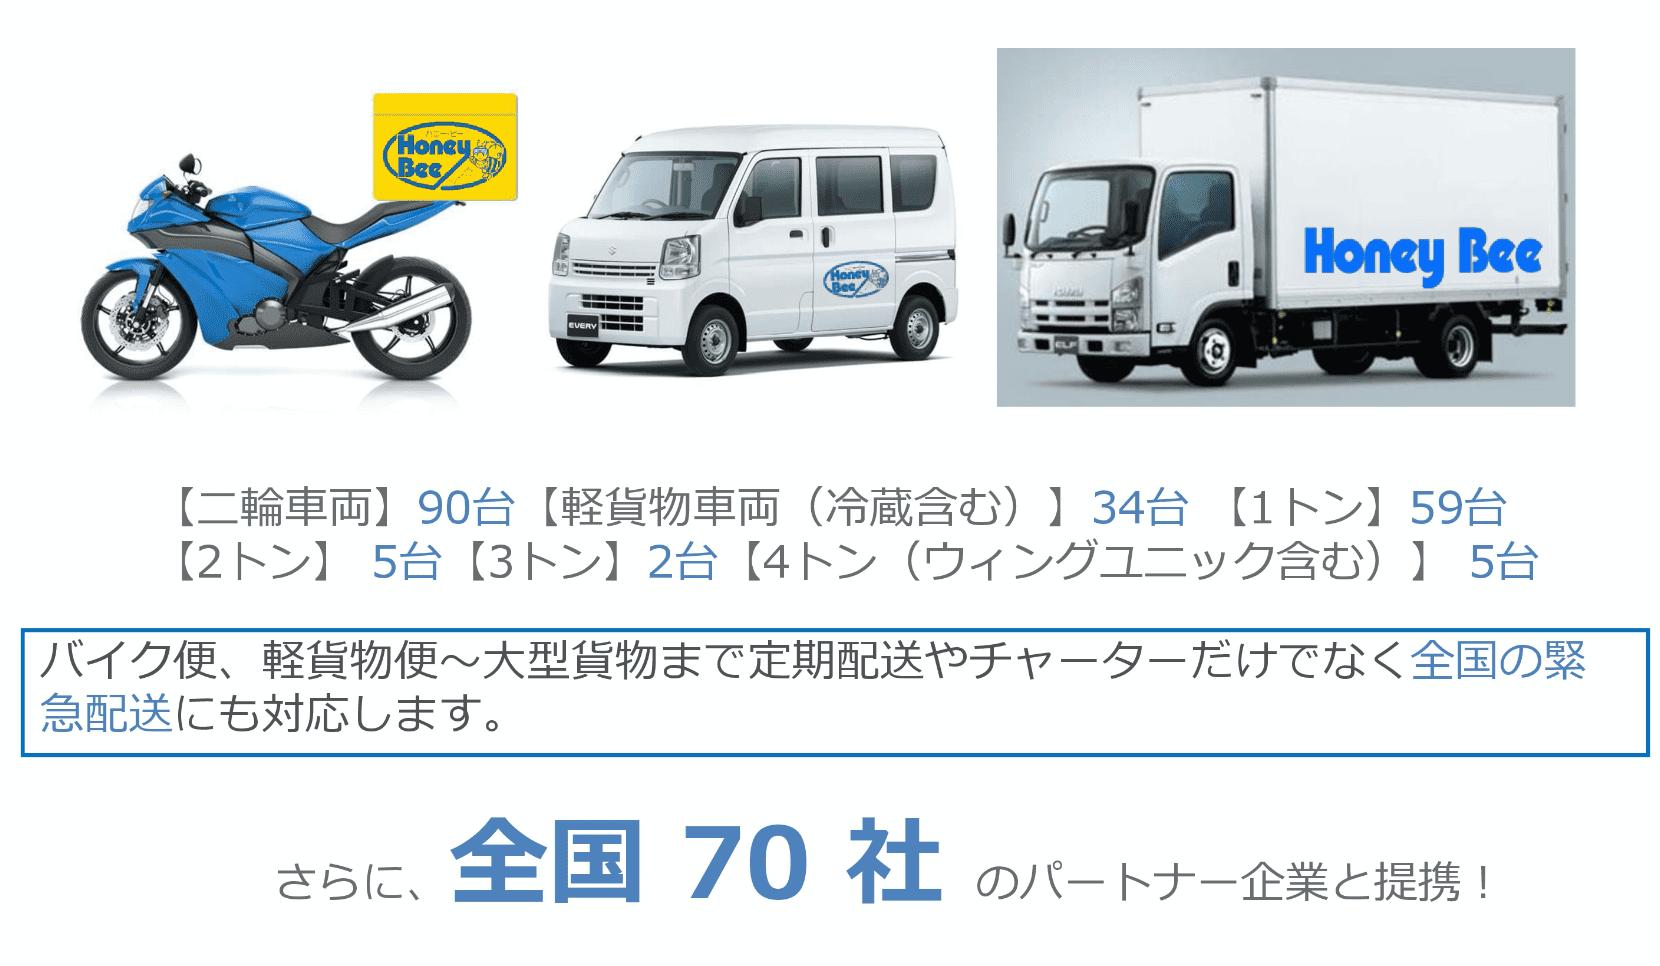 配送⾞両紹介(バイク便、軽貨物便〜大型貨物)